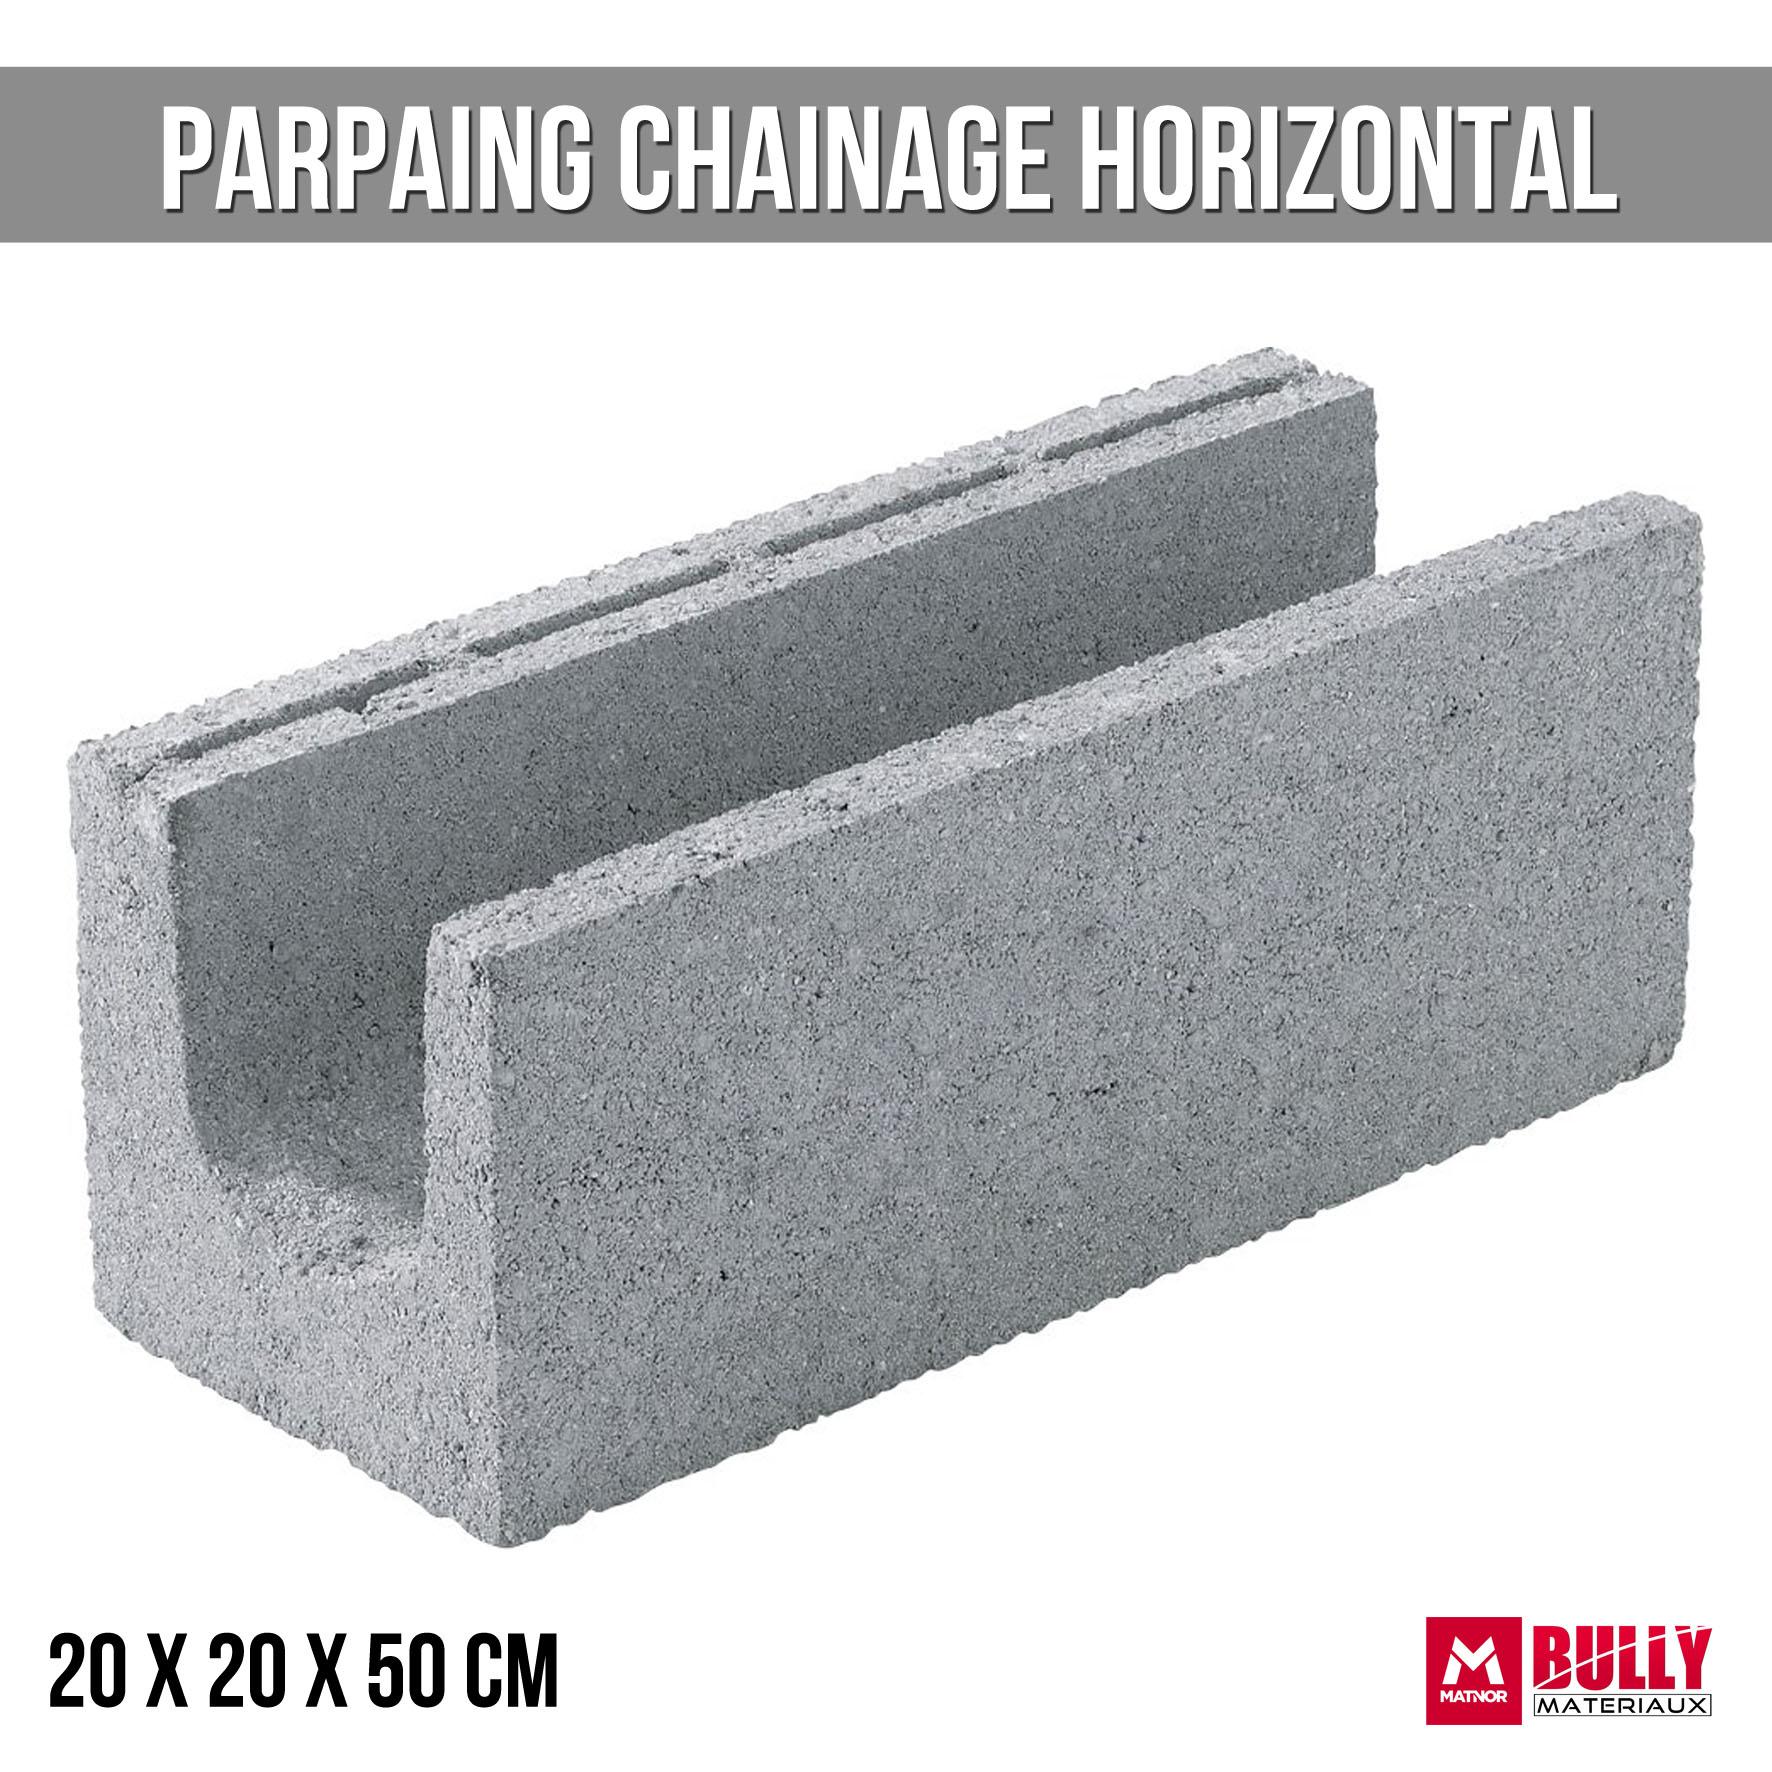 Parpaing ch horizontal 20